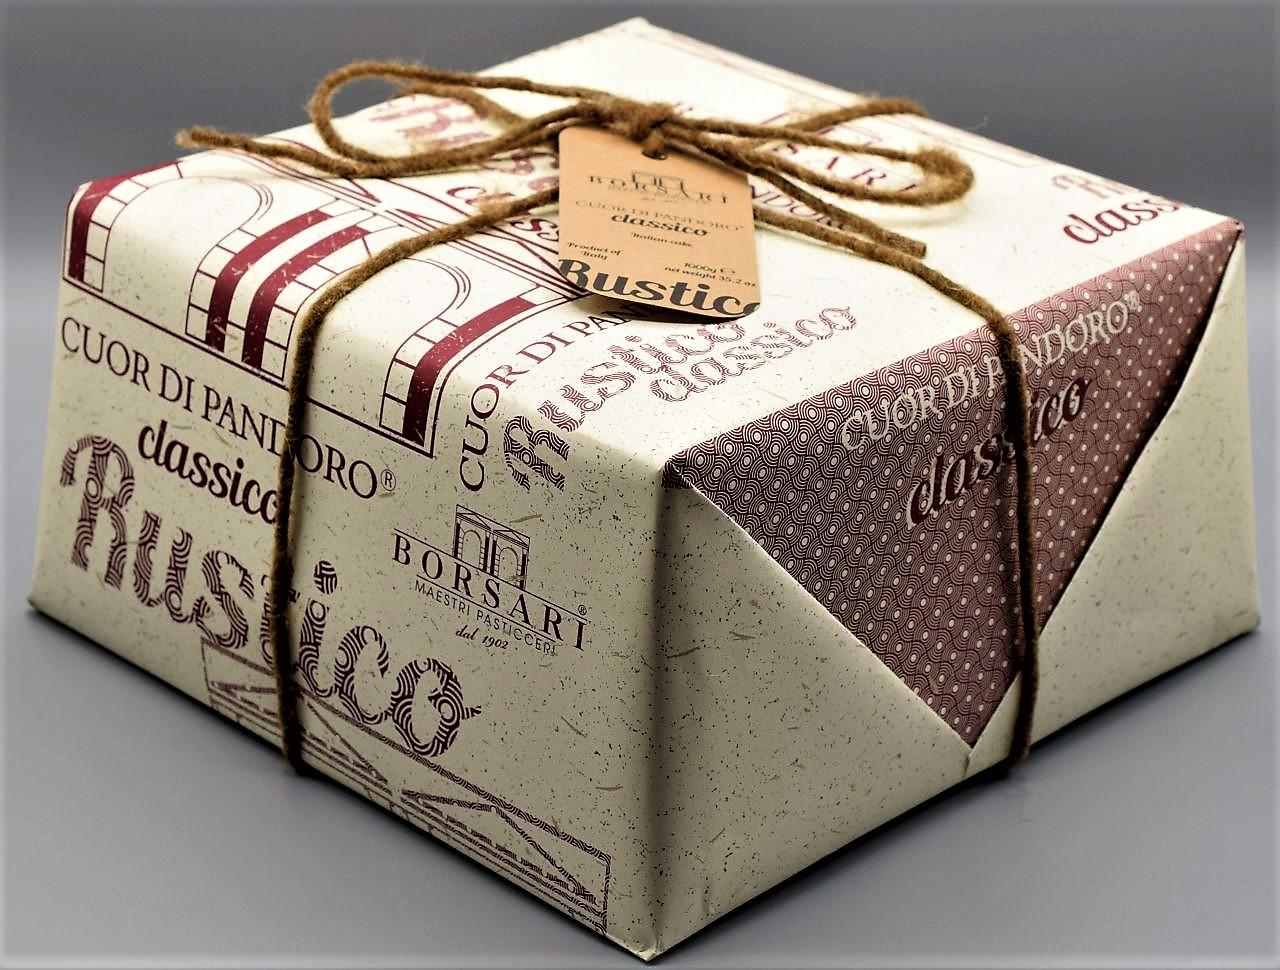 Panettone Borsari Classico